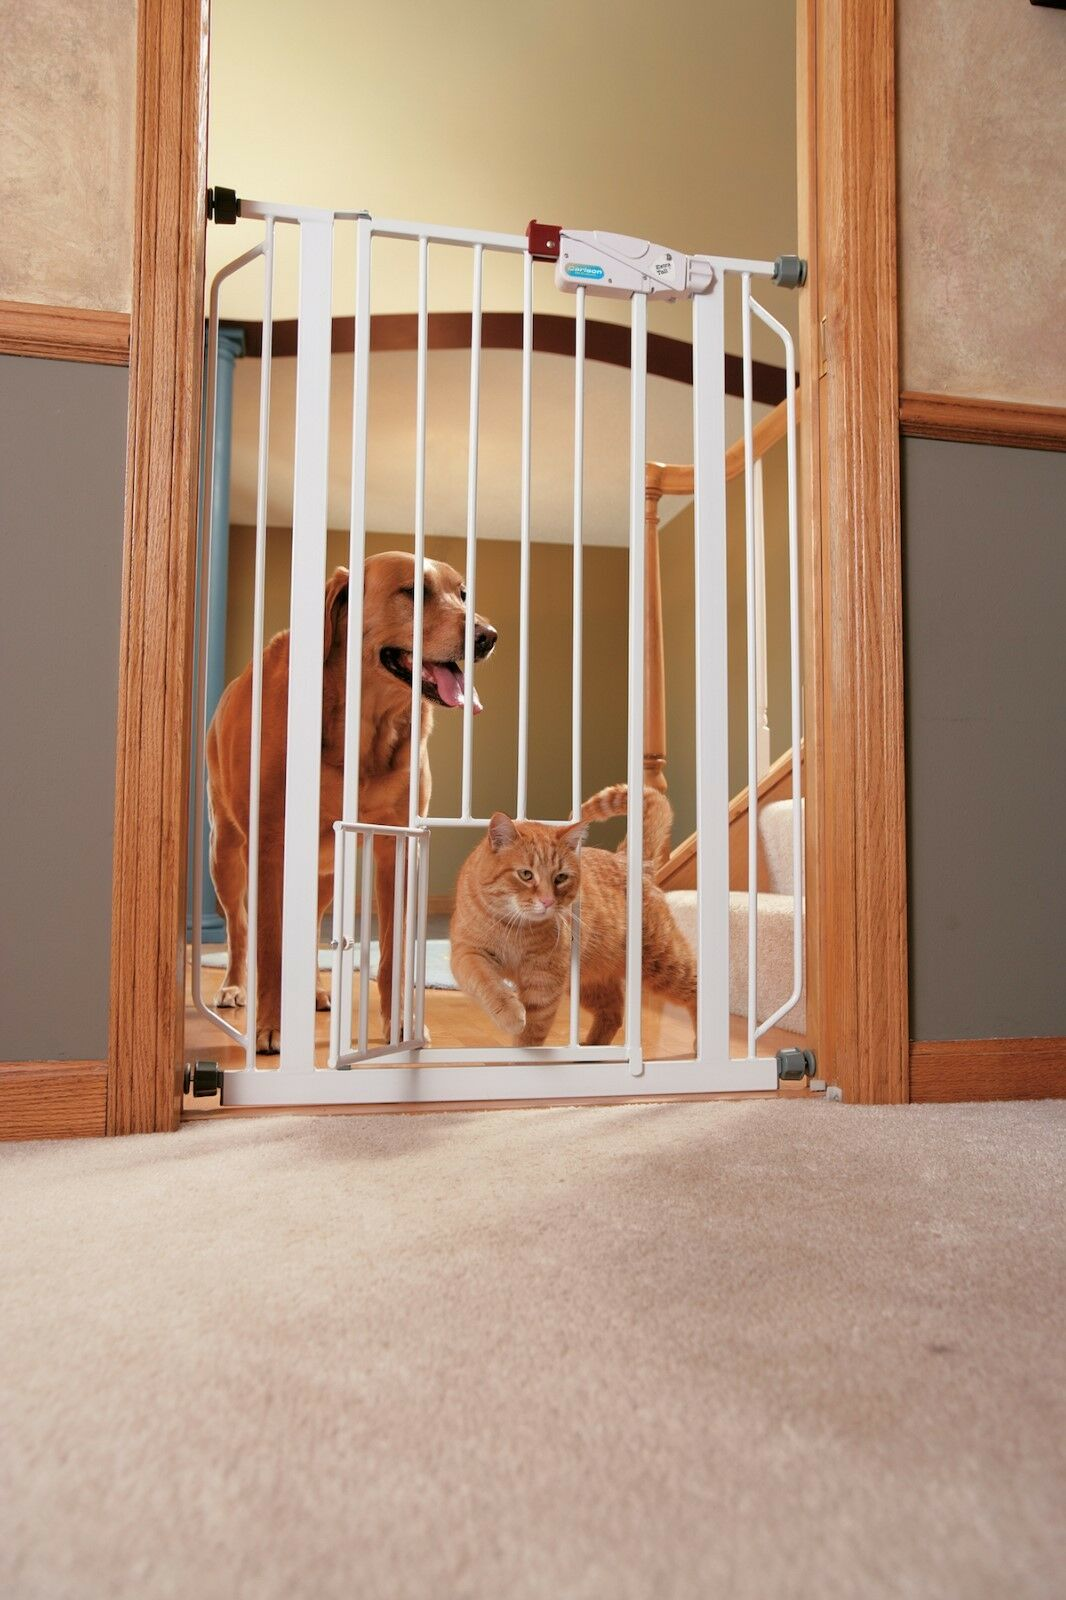 NEW Expandable Steel Pet bianca Door Gate Extra Tall Doorway Dog Gates Walk-Thru